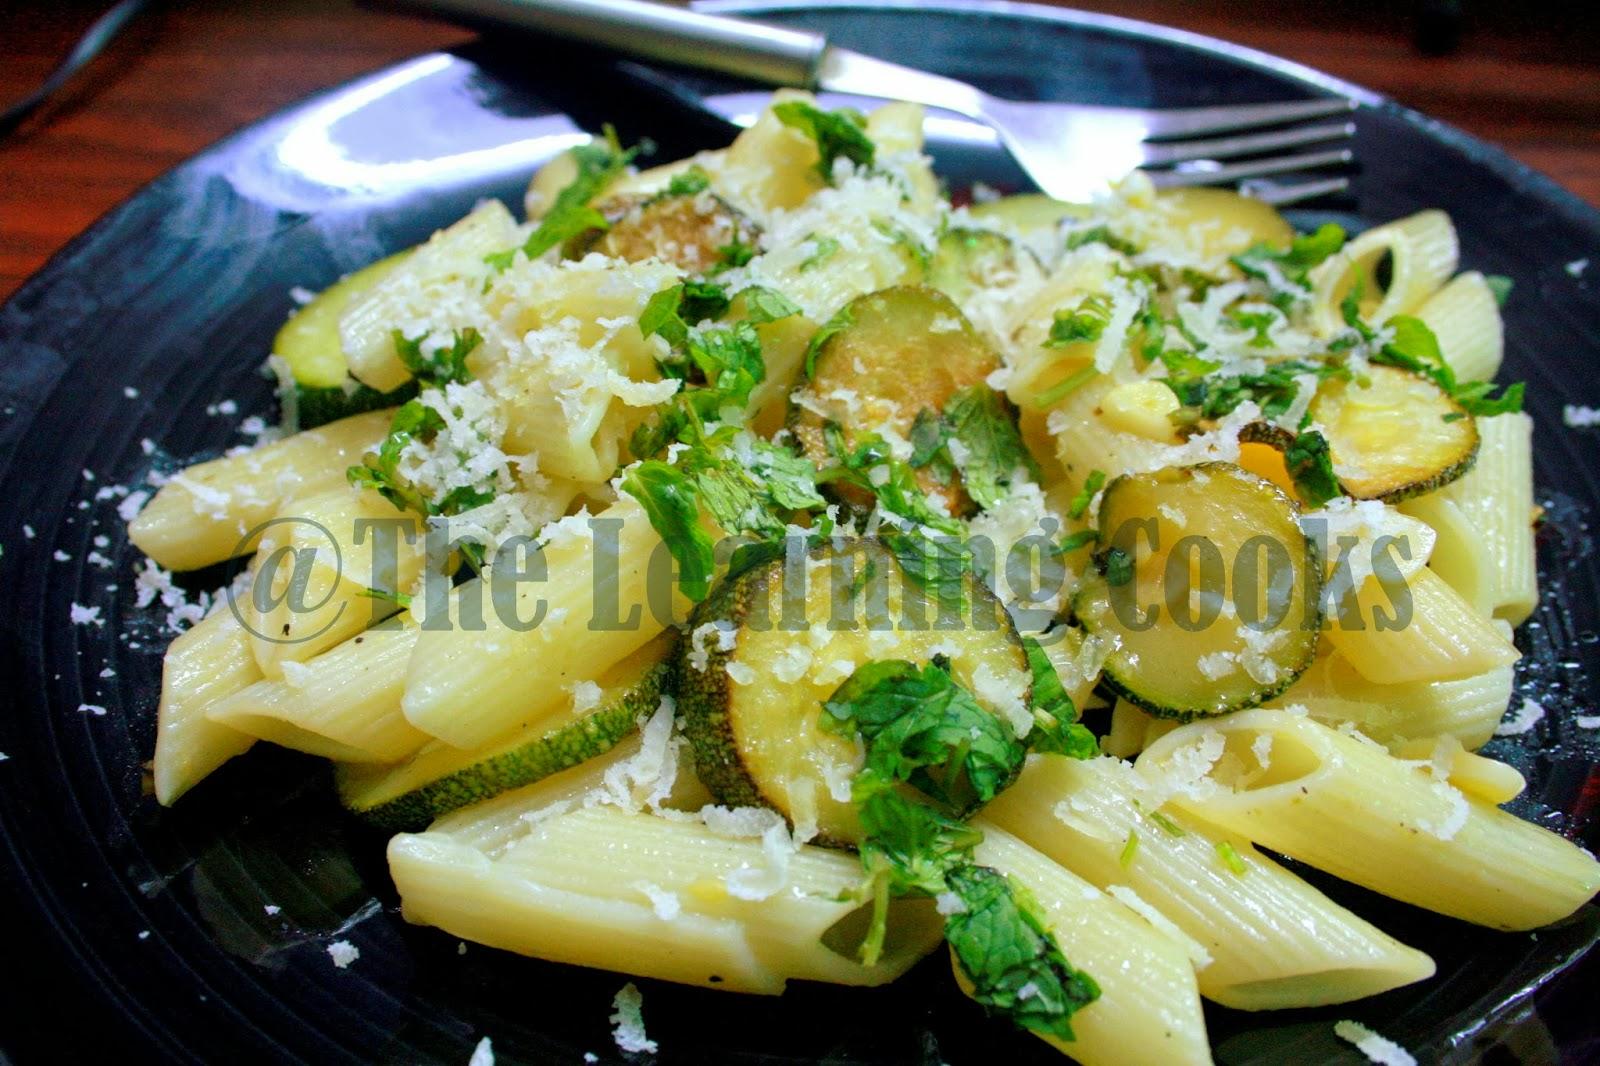 ... Cooks: Zucchini, Lemon & Mint Pasta ~ Easy & Light Pasta Recipe